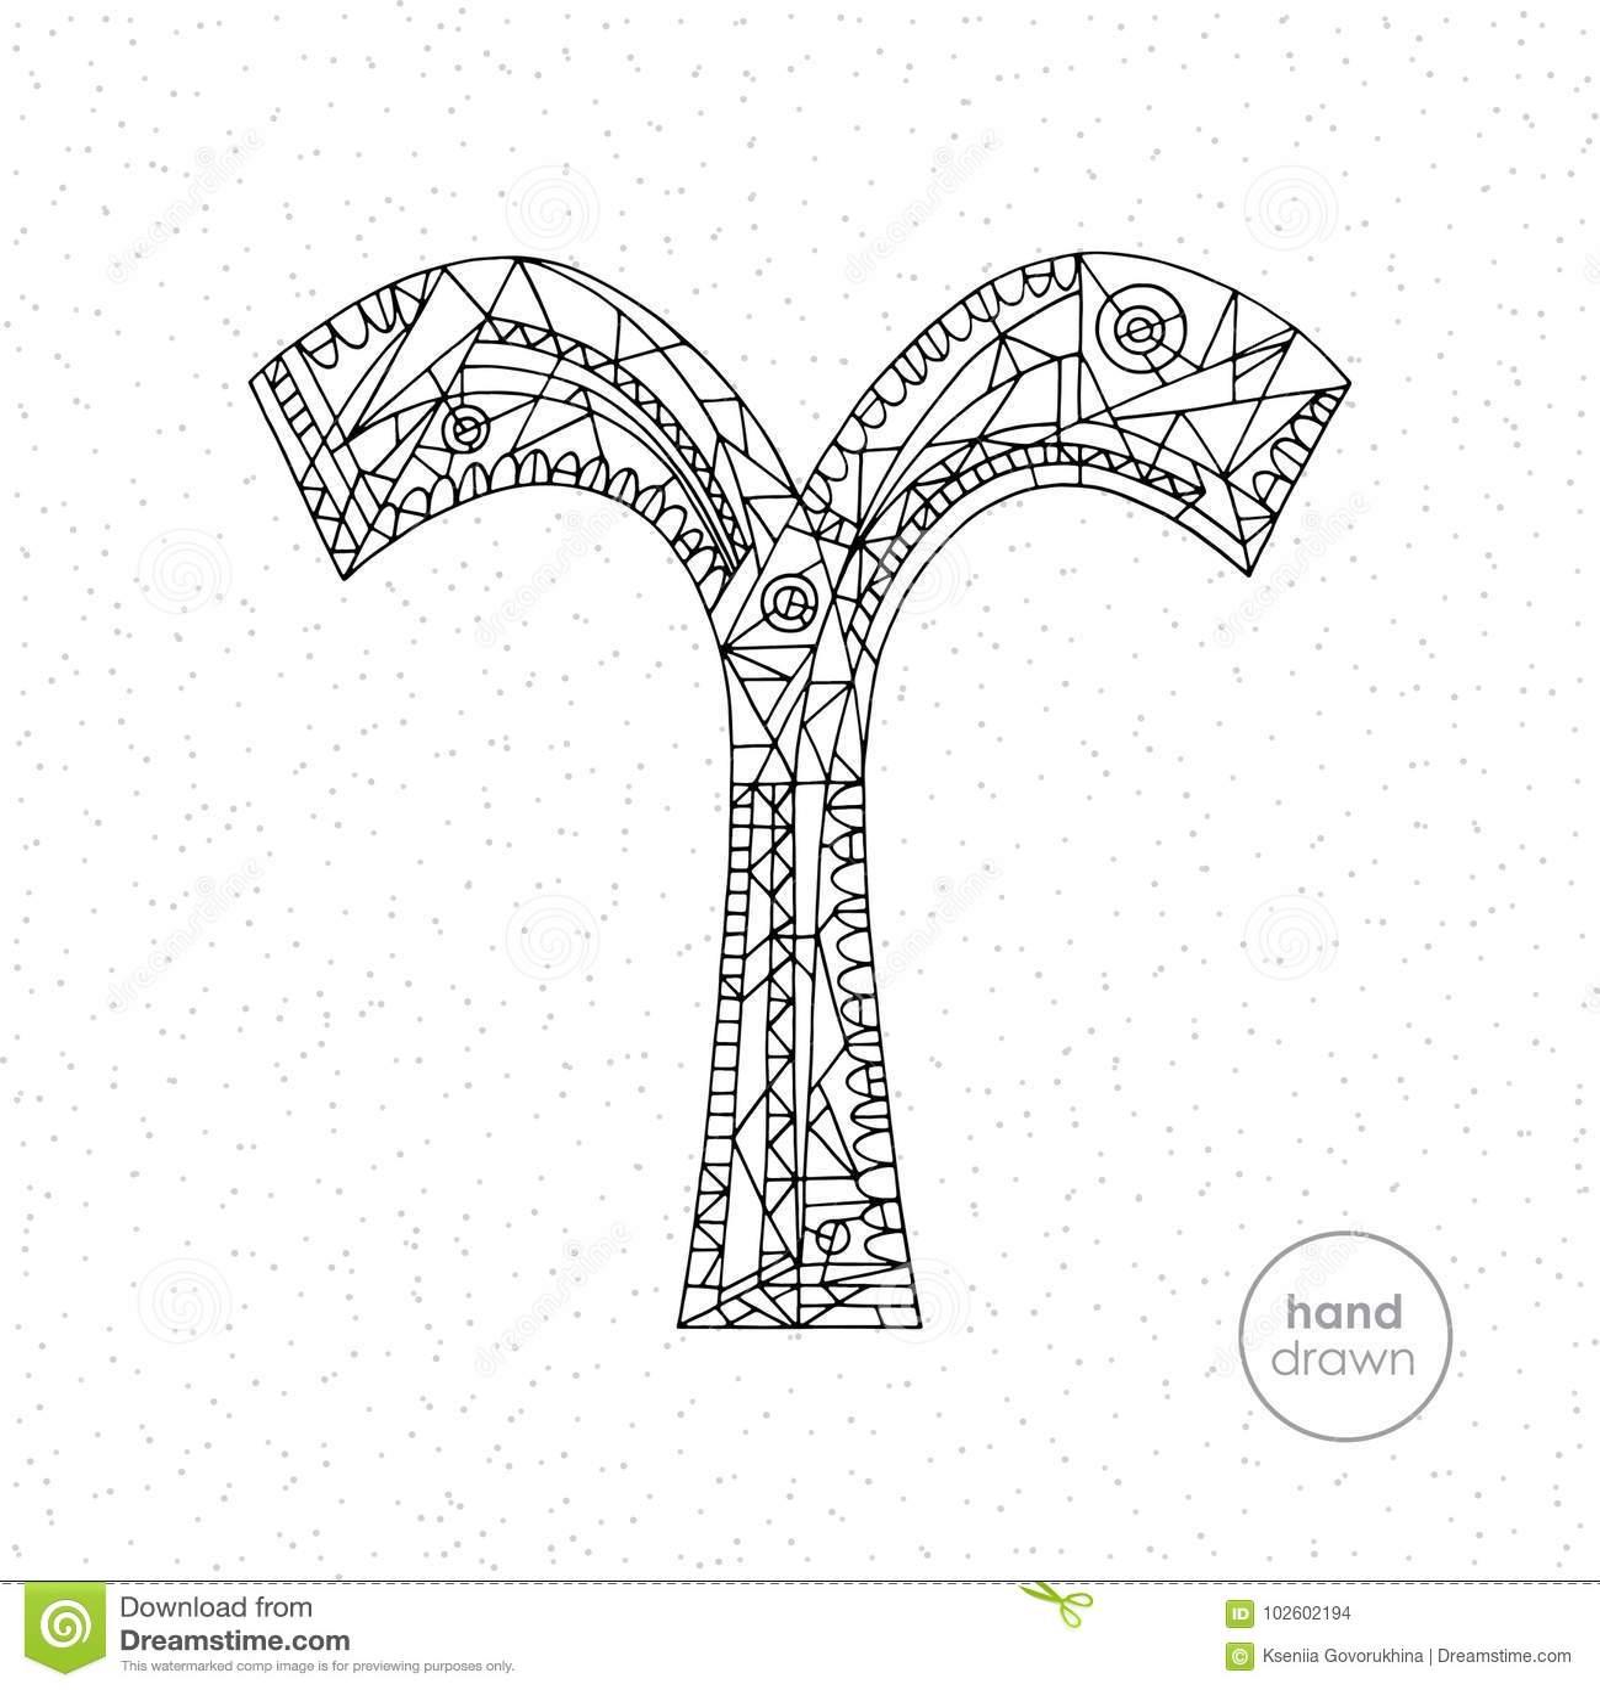 Aries Zodiac Sign. Vector Hand Drawn Horoscope